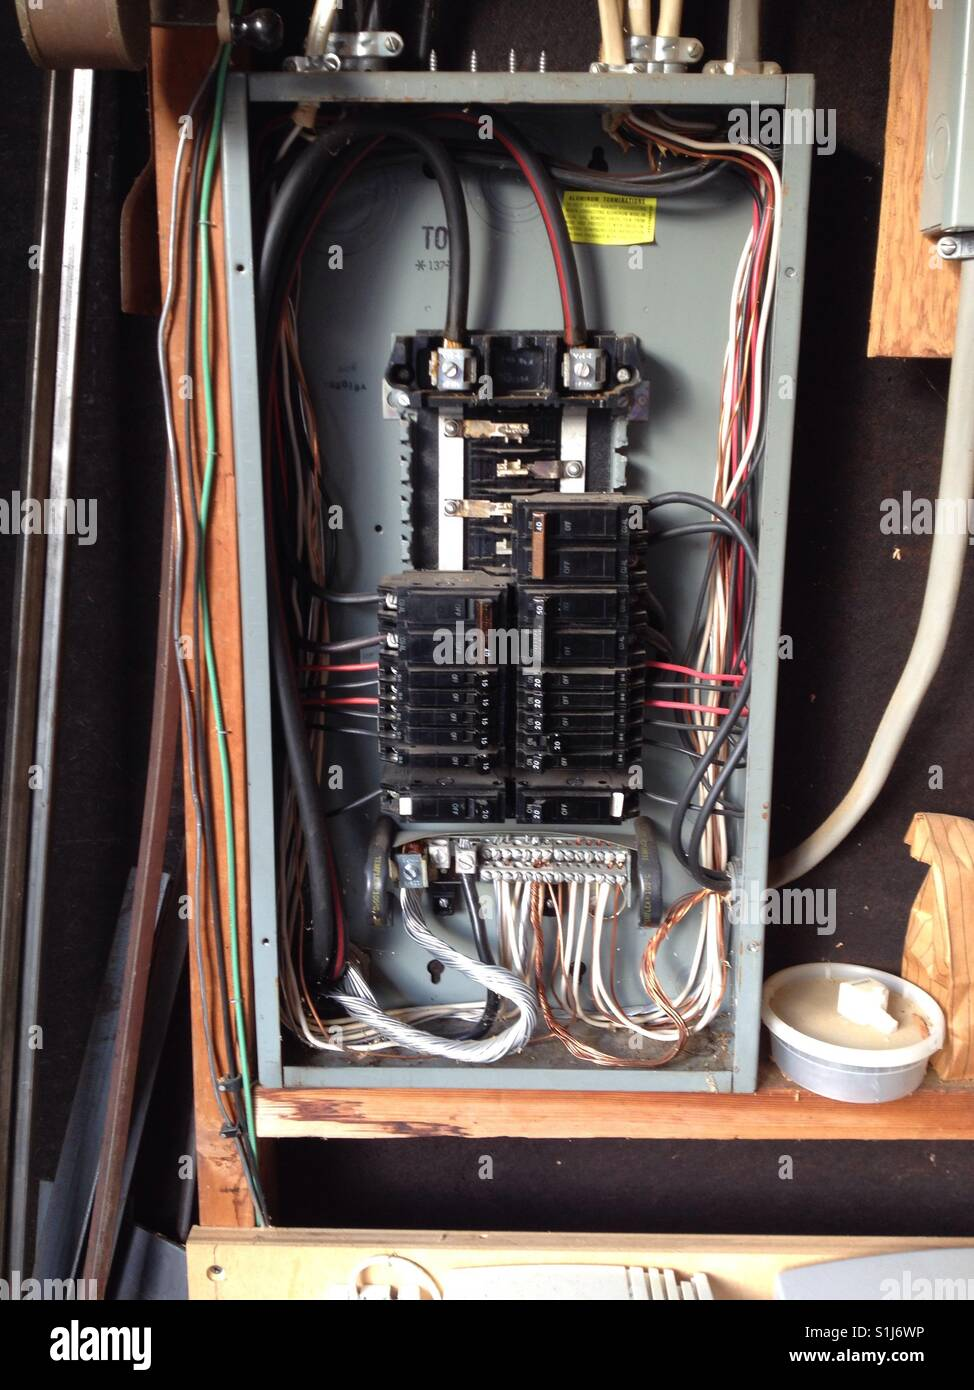 medium resolution of circuit breaker box interior stock image